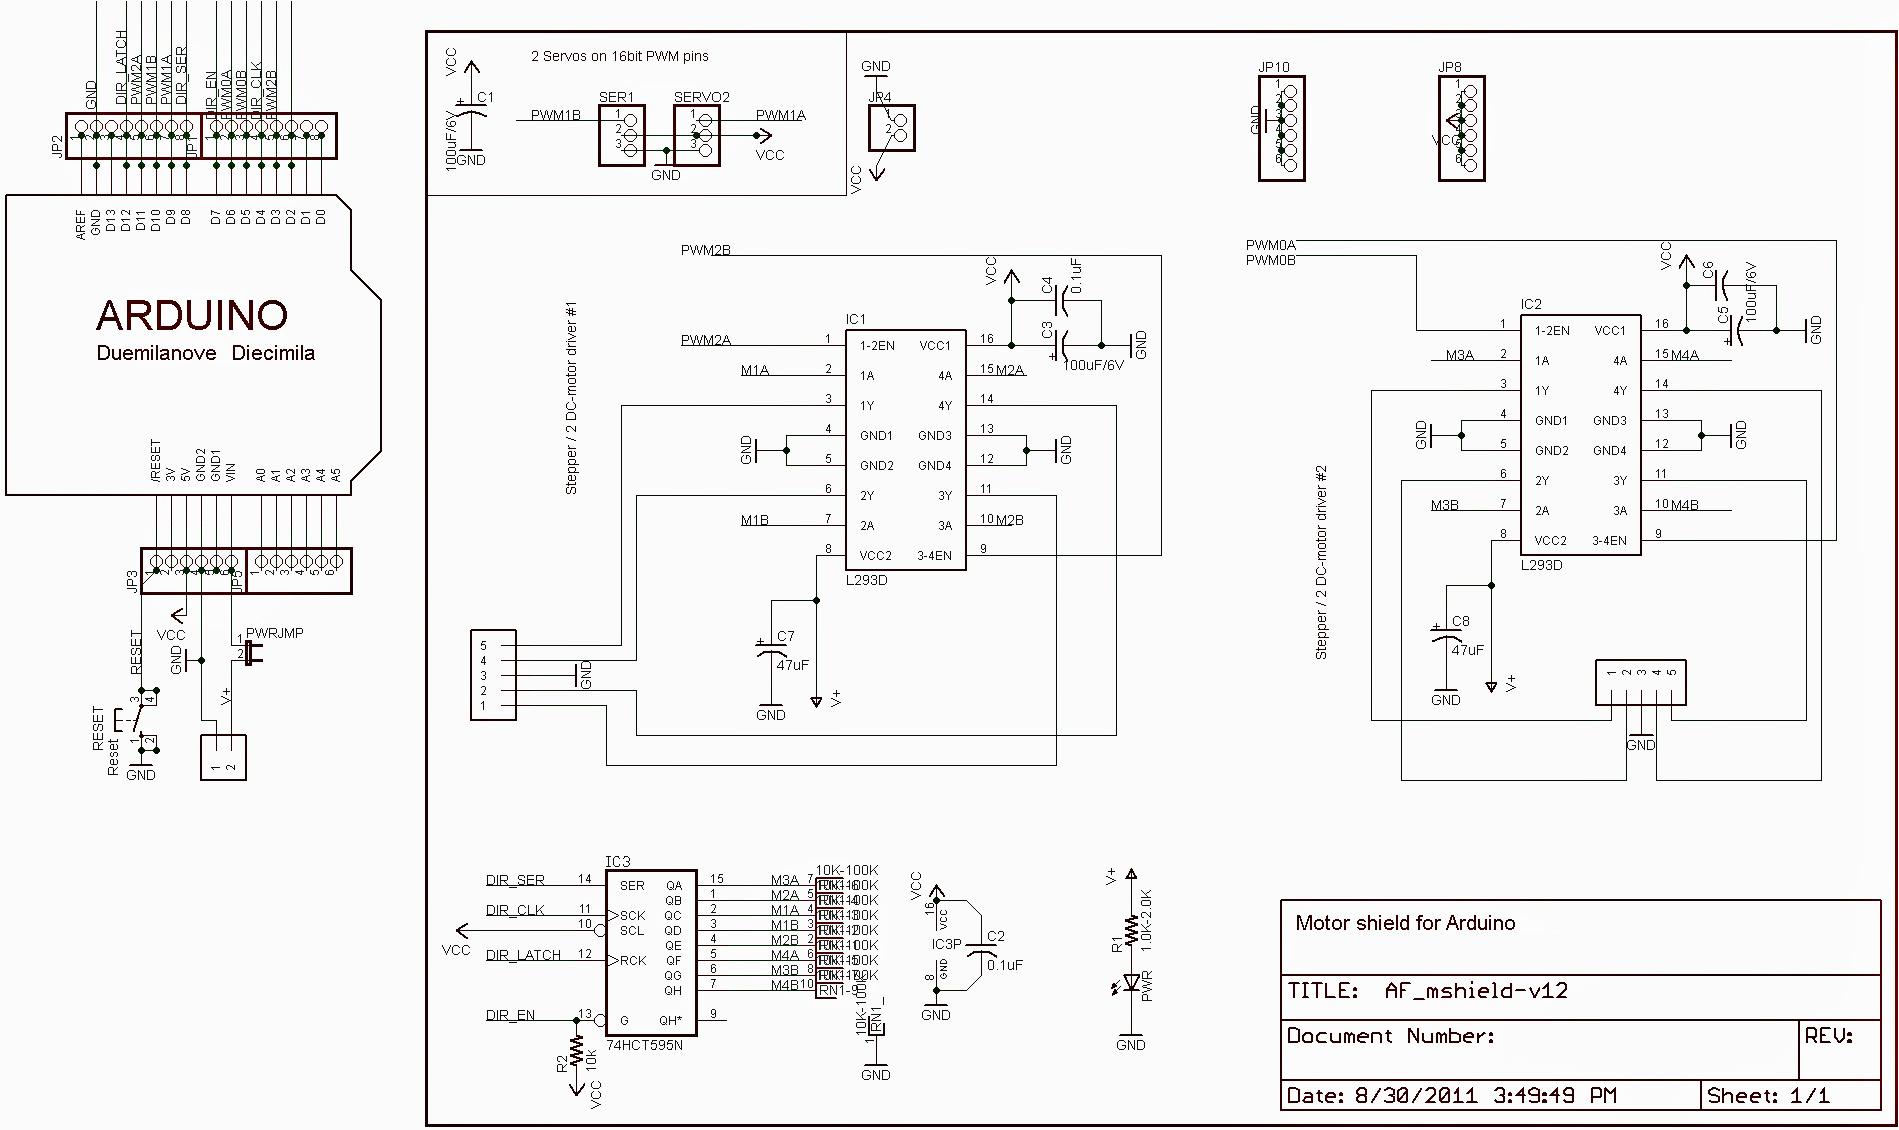 BSK DC MOTOR SHIELD L293D 1 2A - Communica [Part No: BSK DC